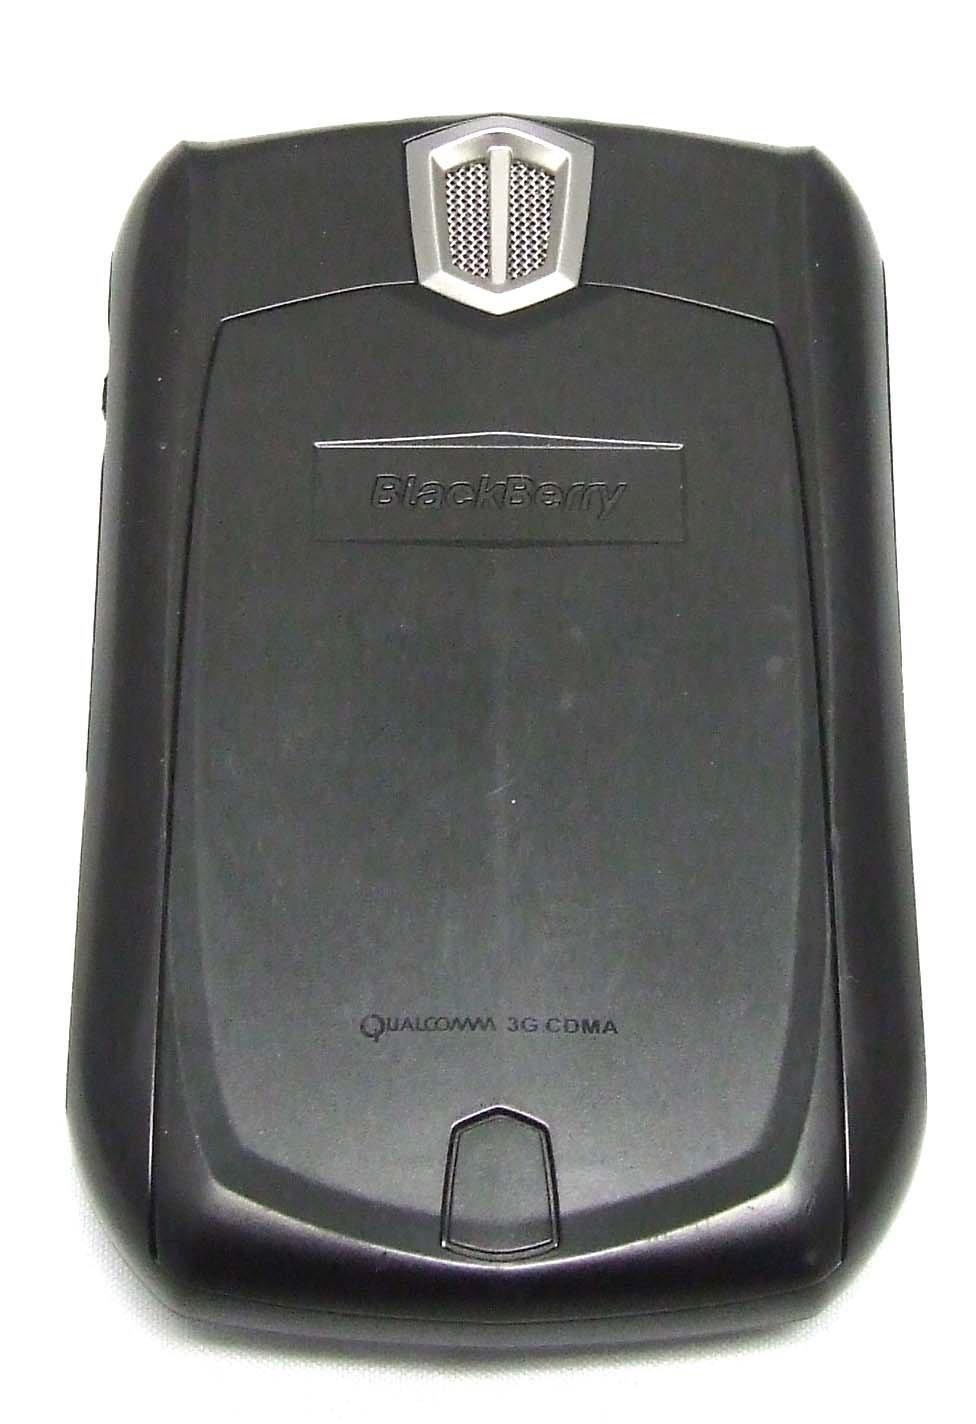 amazon com blackberry 8703e phone sprint pcs electronics rh amazon com